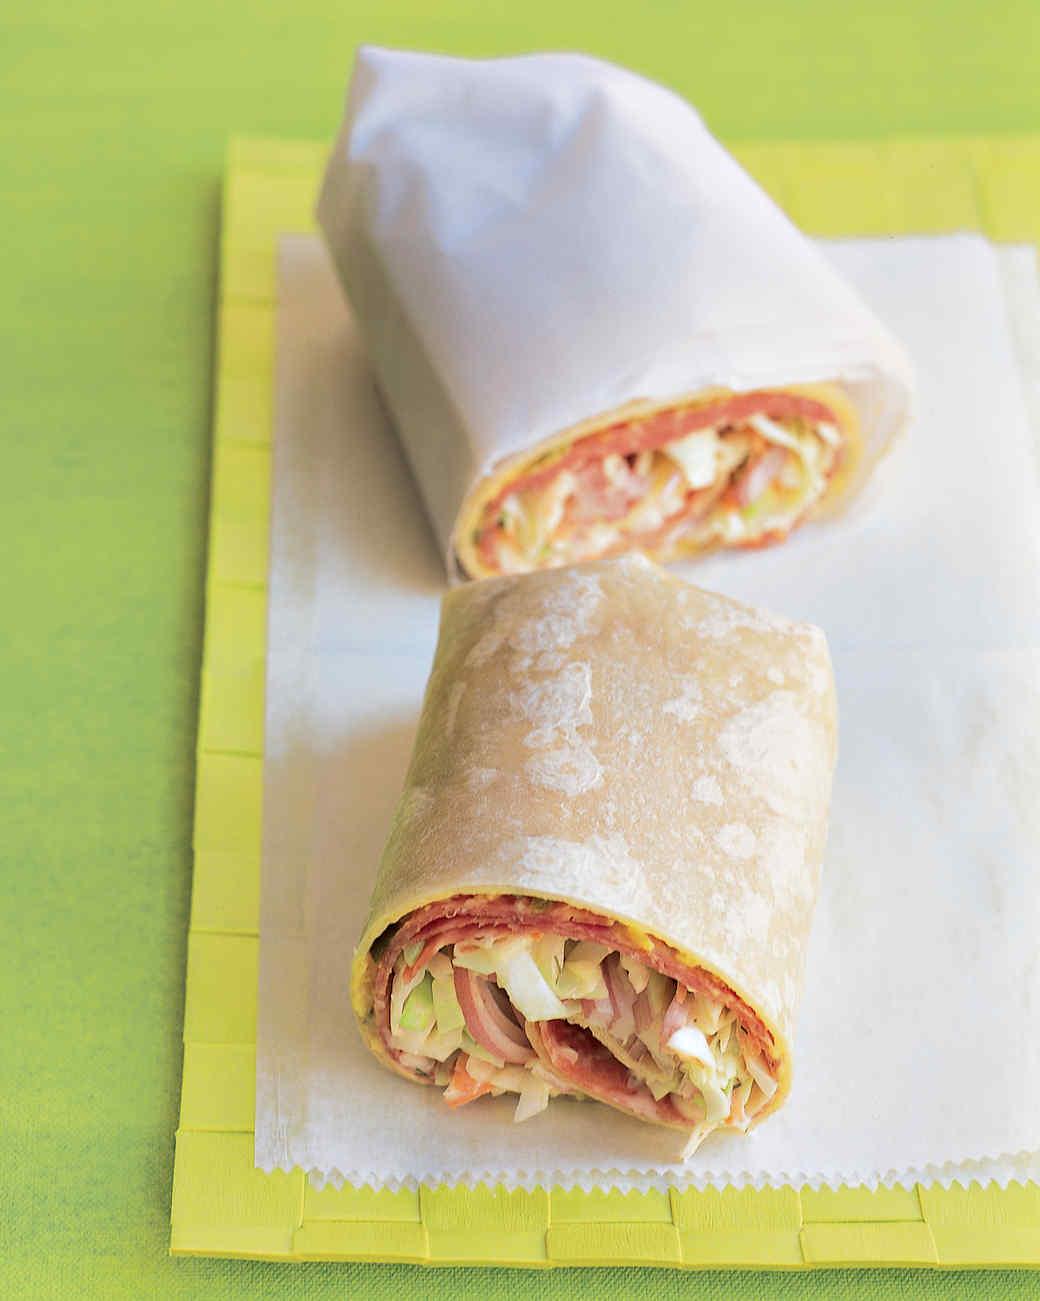 Salami and Coleslaw Wrap